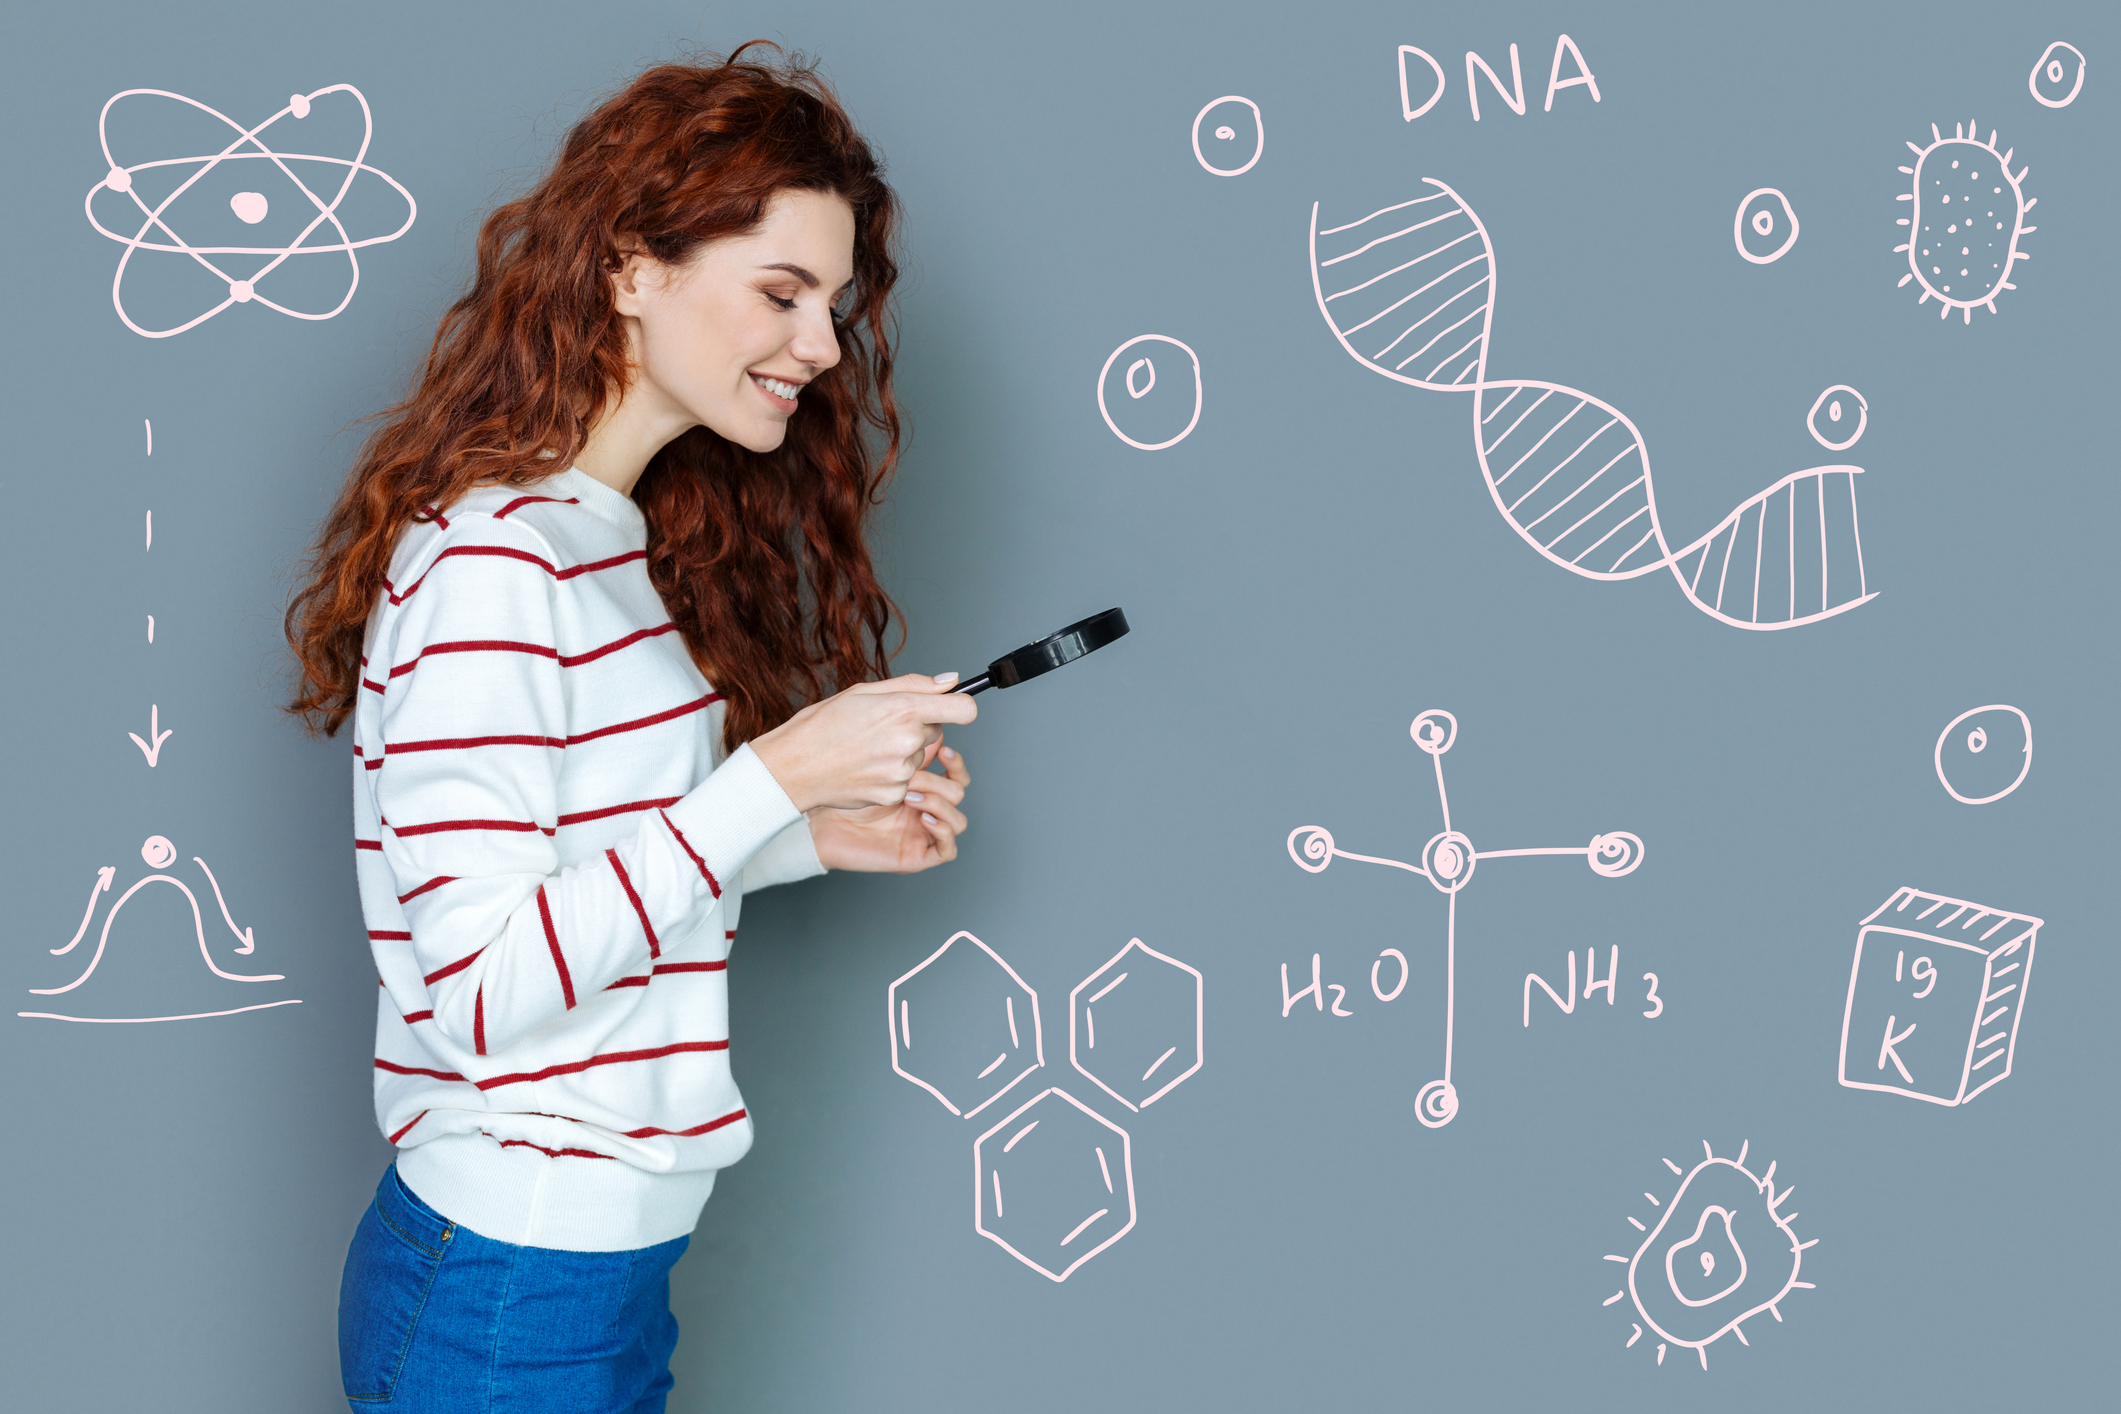 SNP Genetic Variations The Affect Fertility.jpg